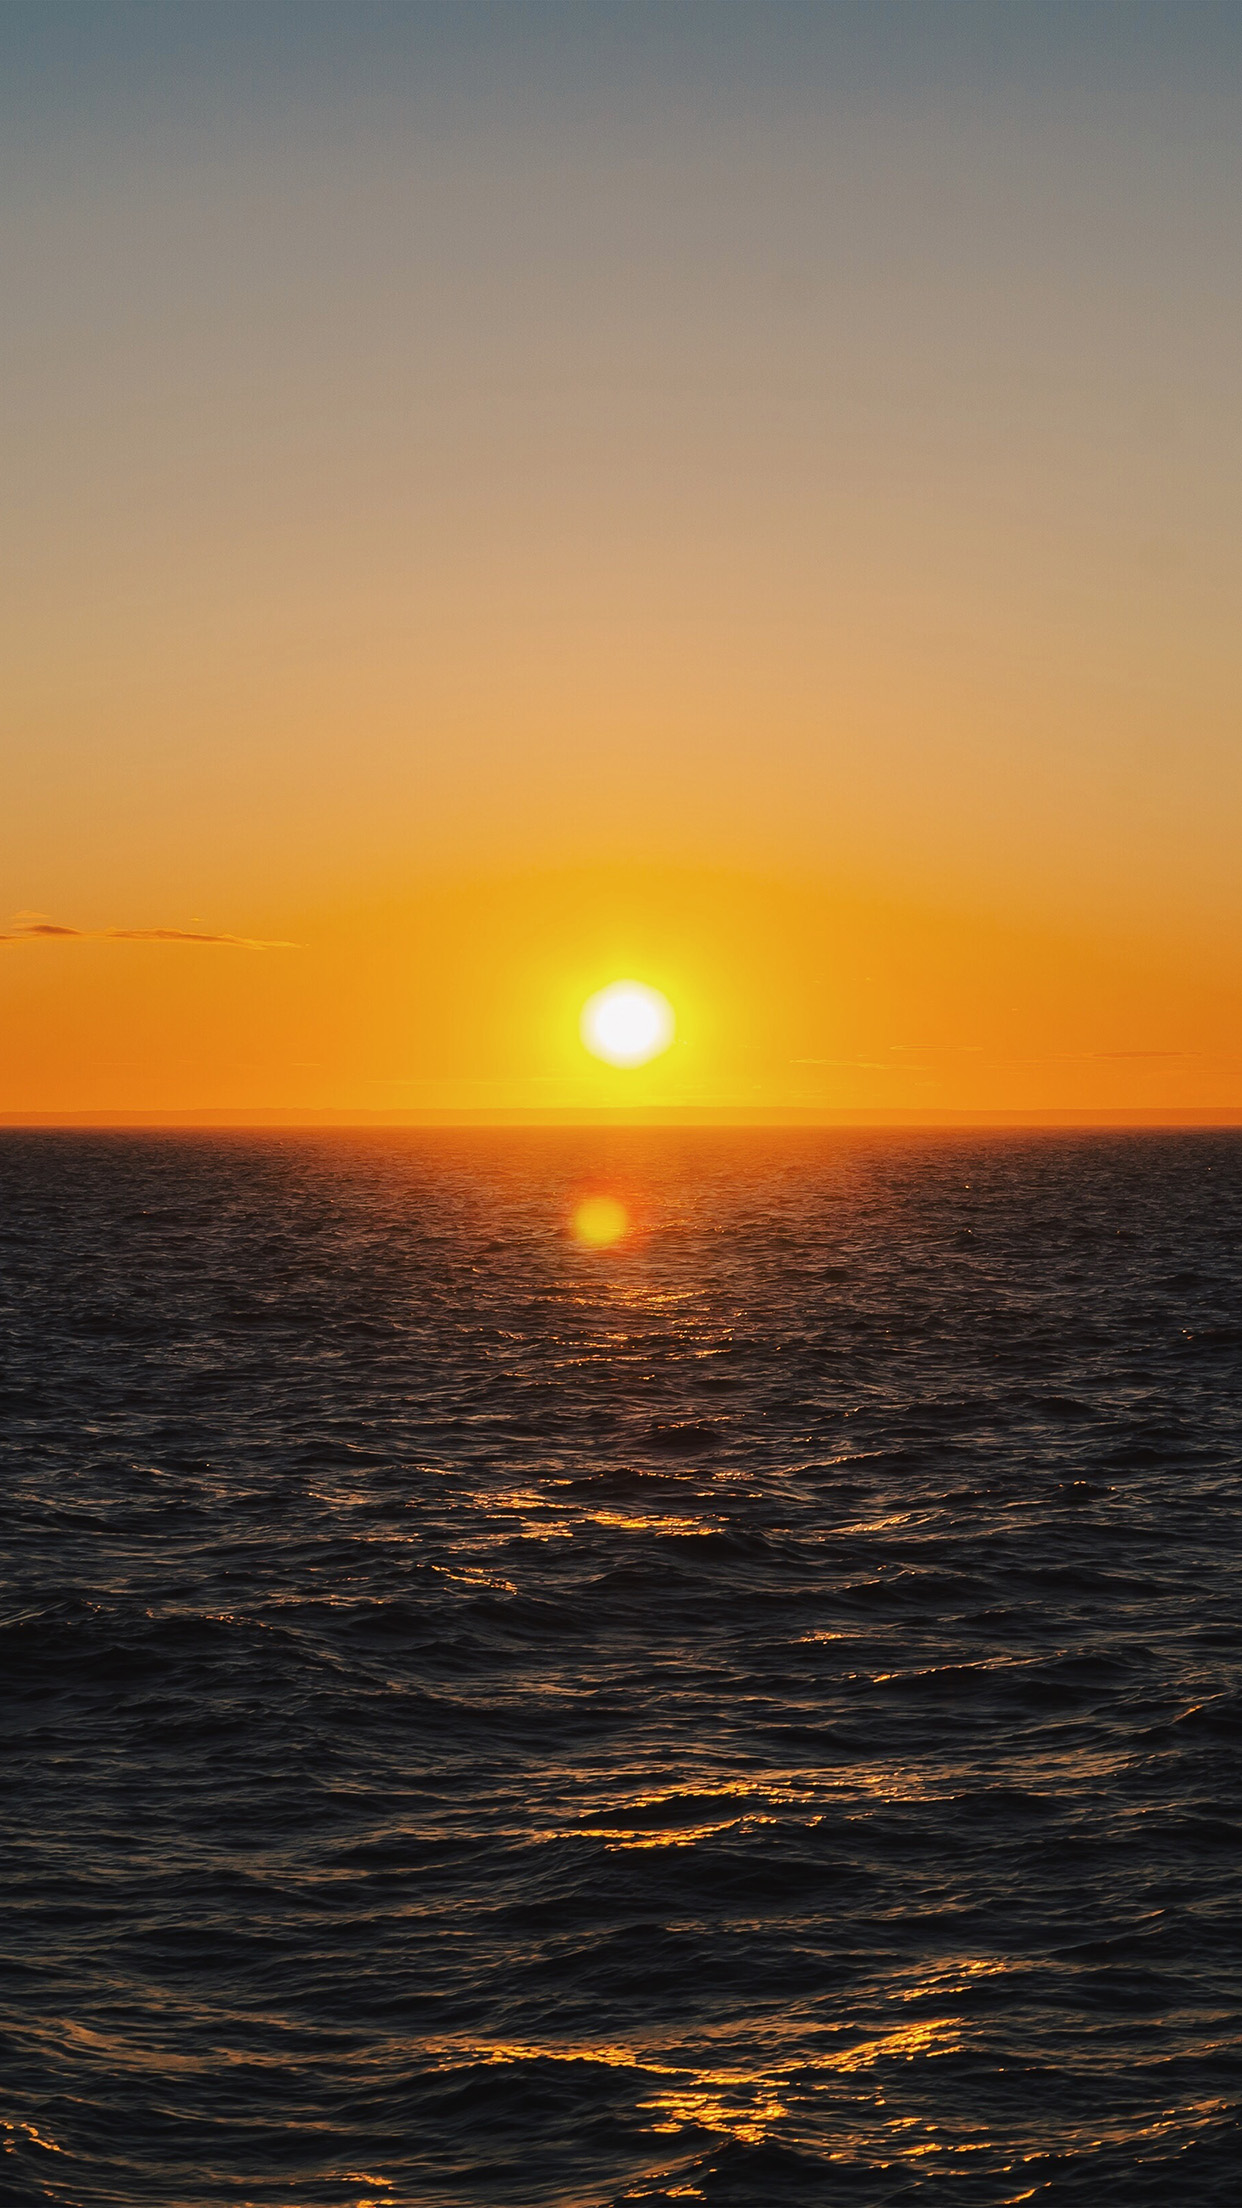 Iphone 11 Wallpaper Sunset